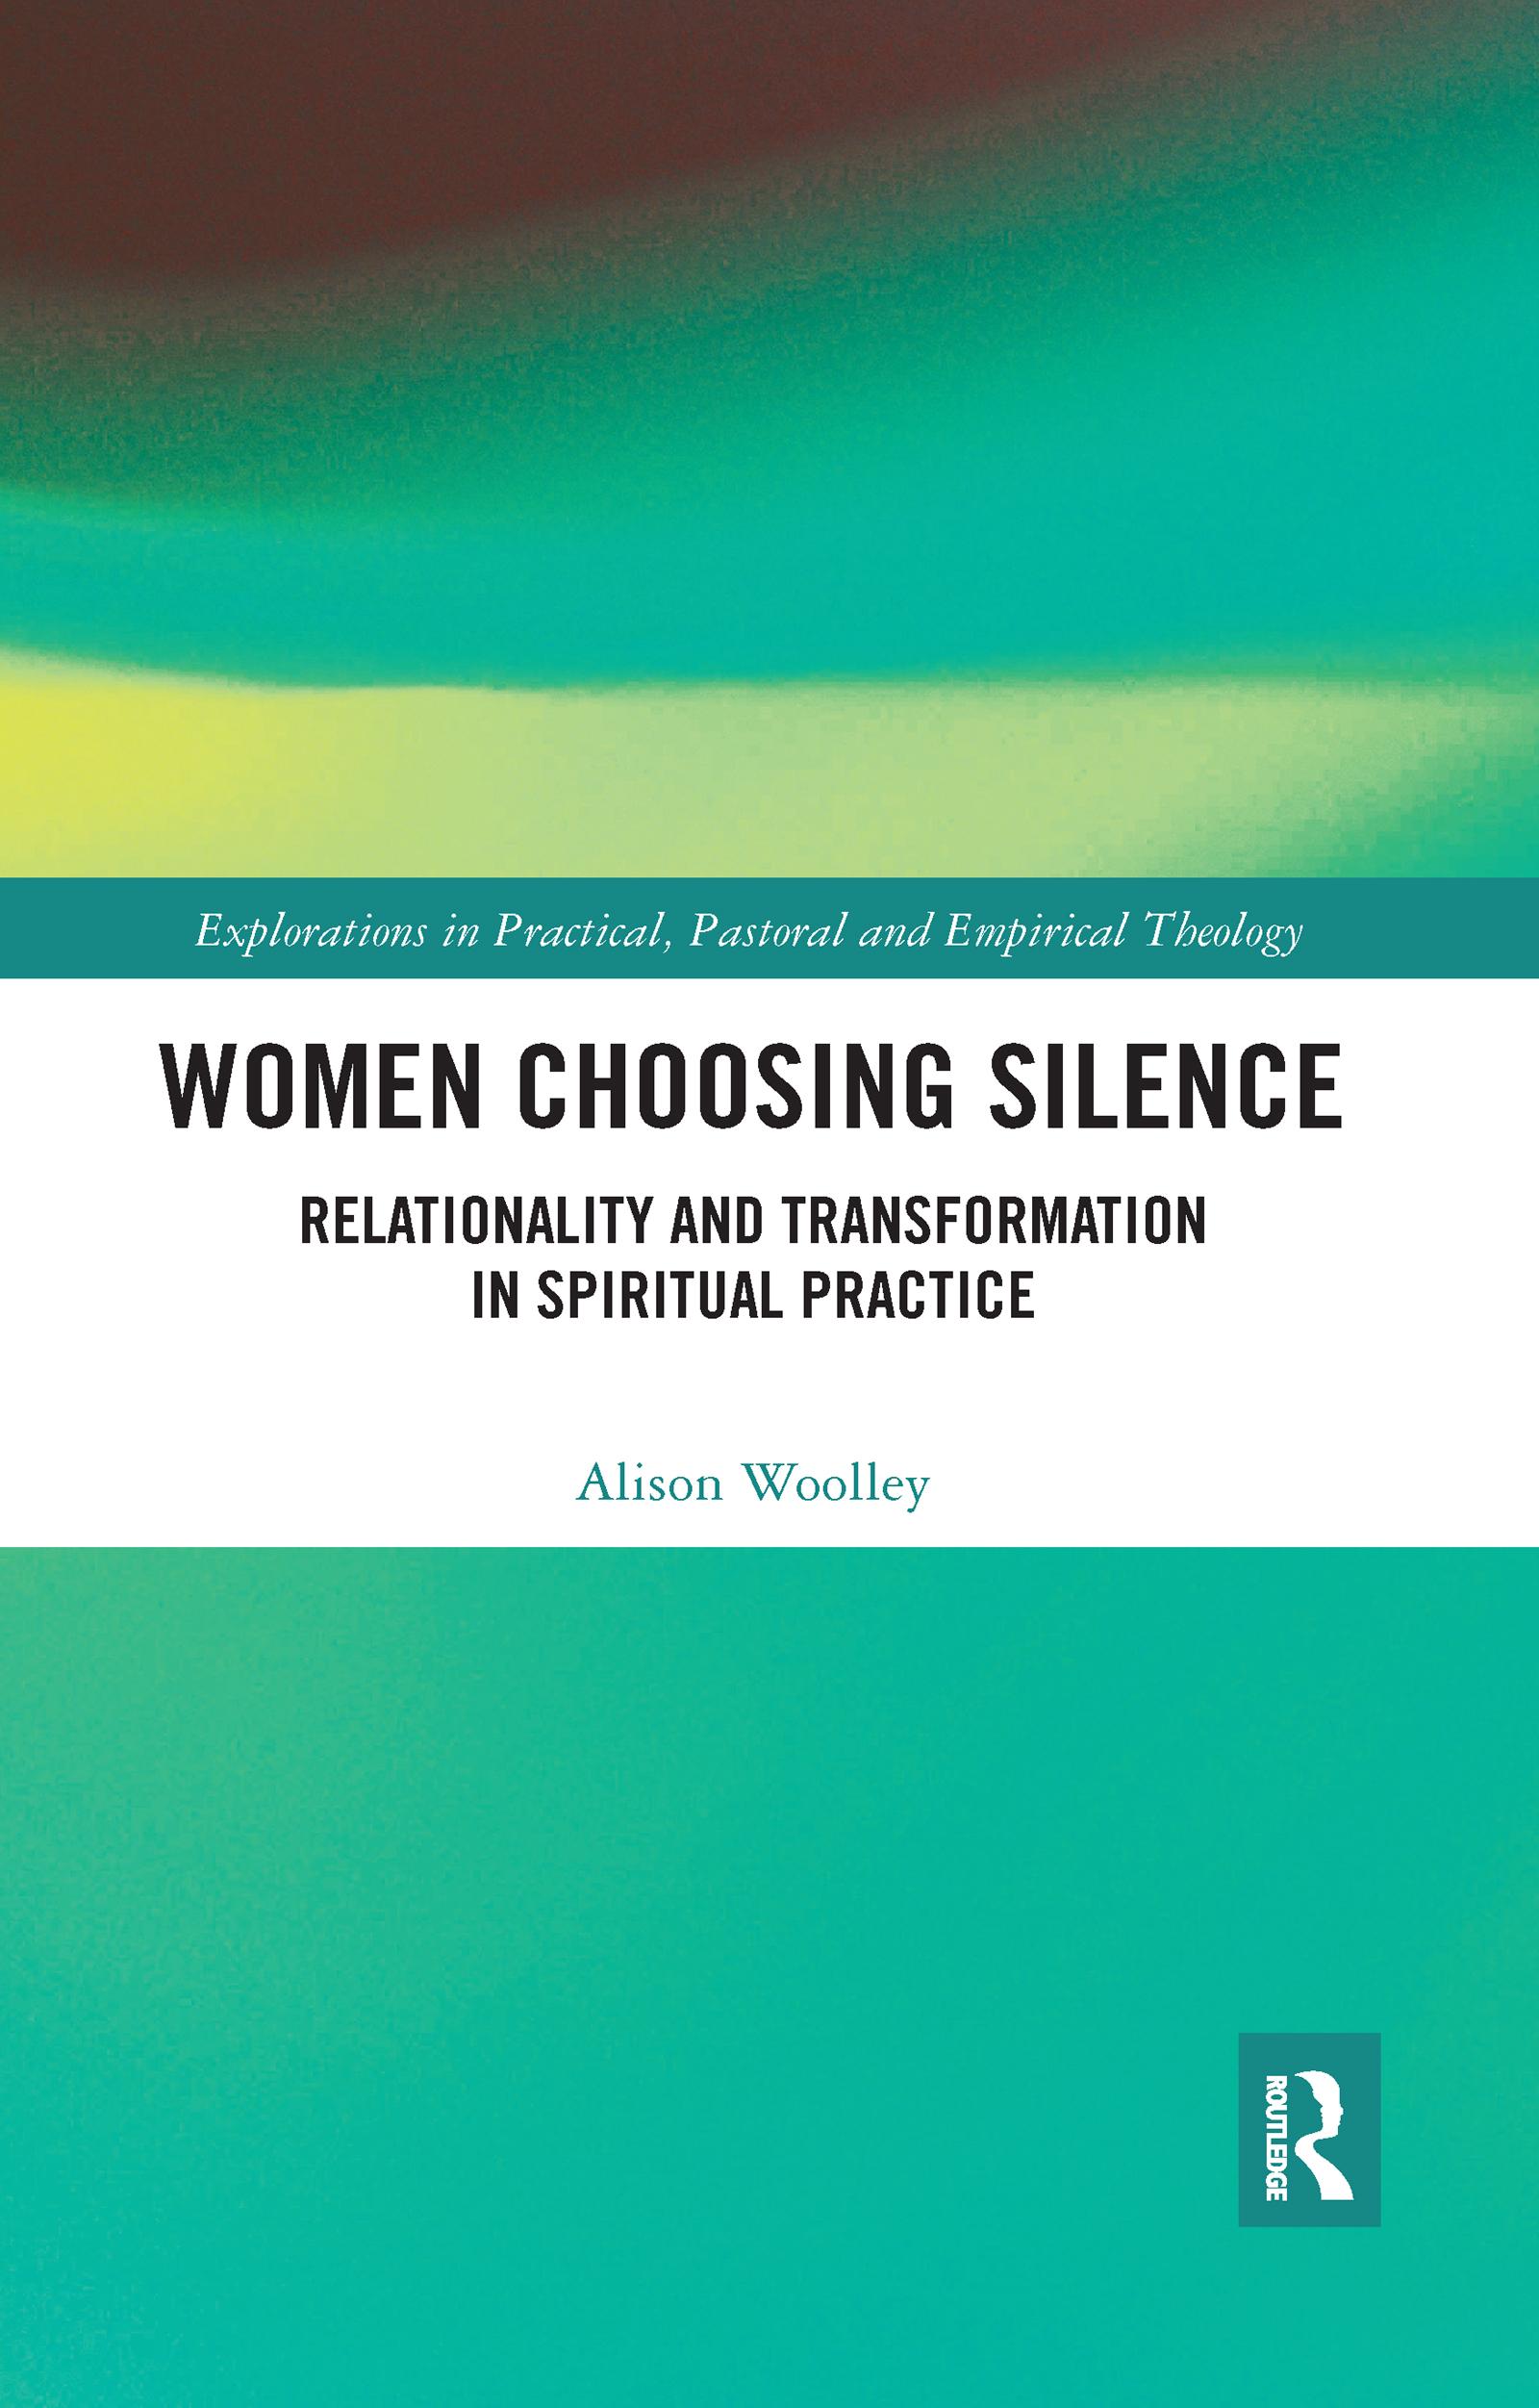 Women Choosing Silence